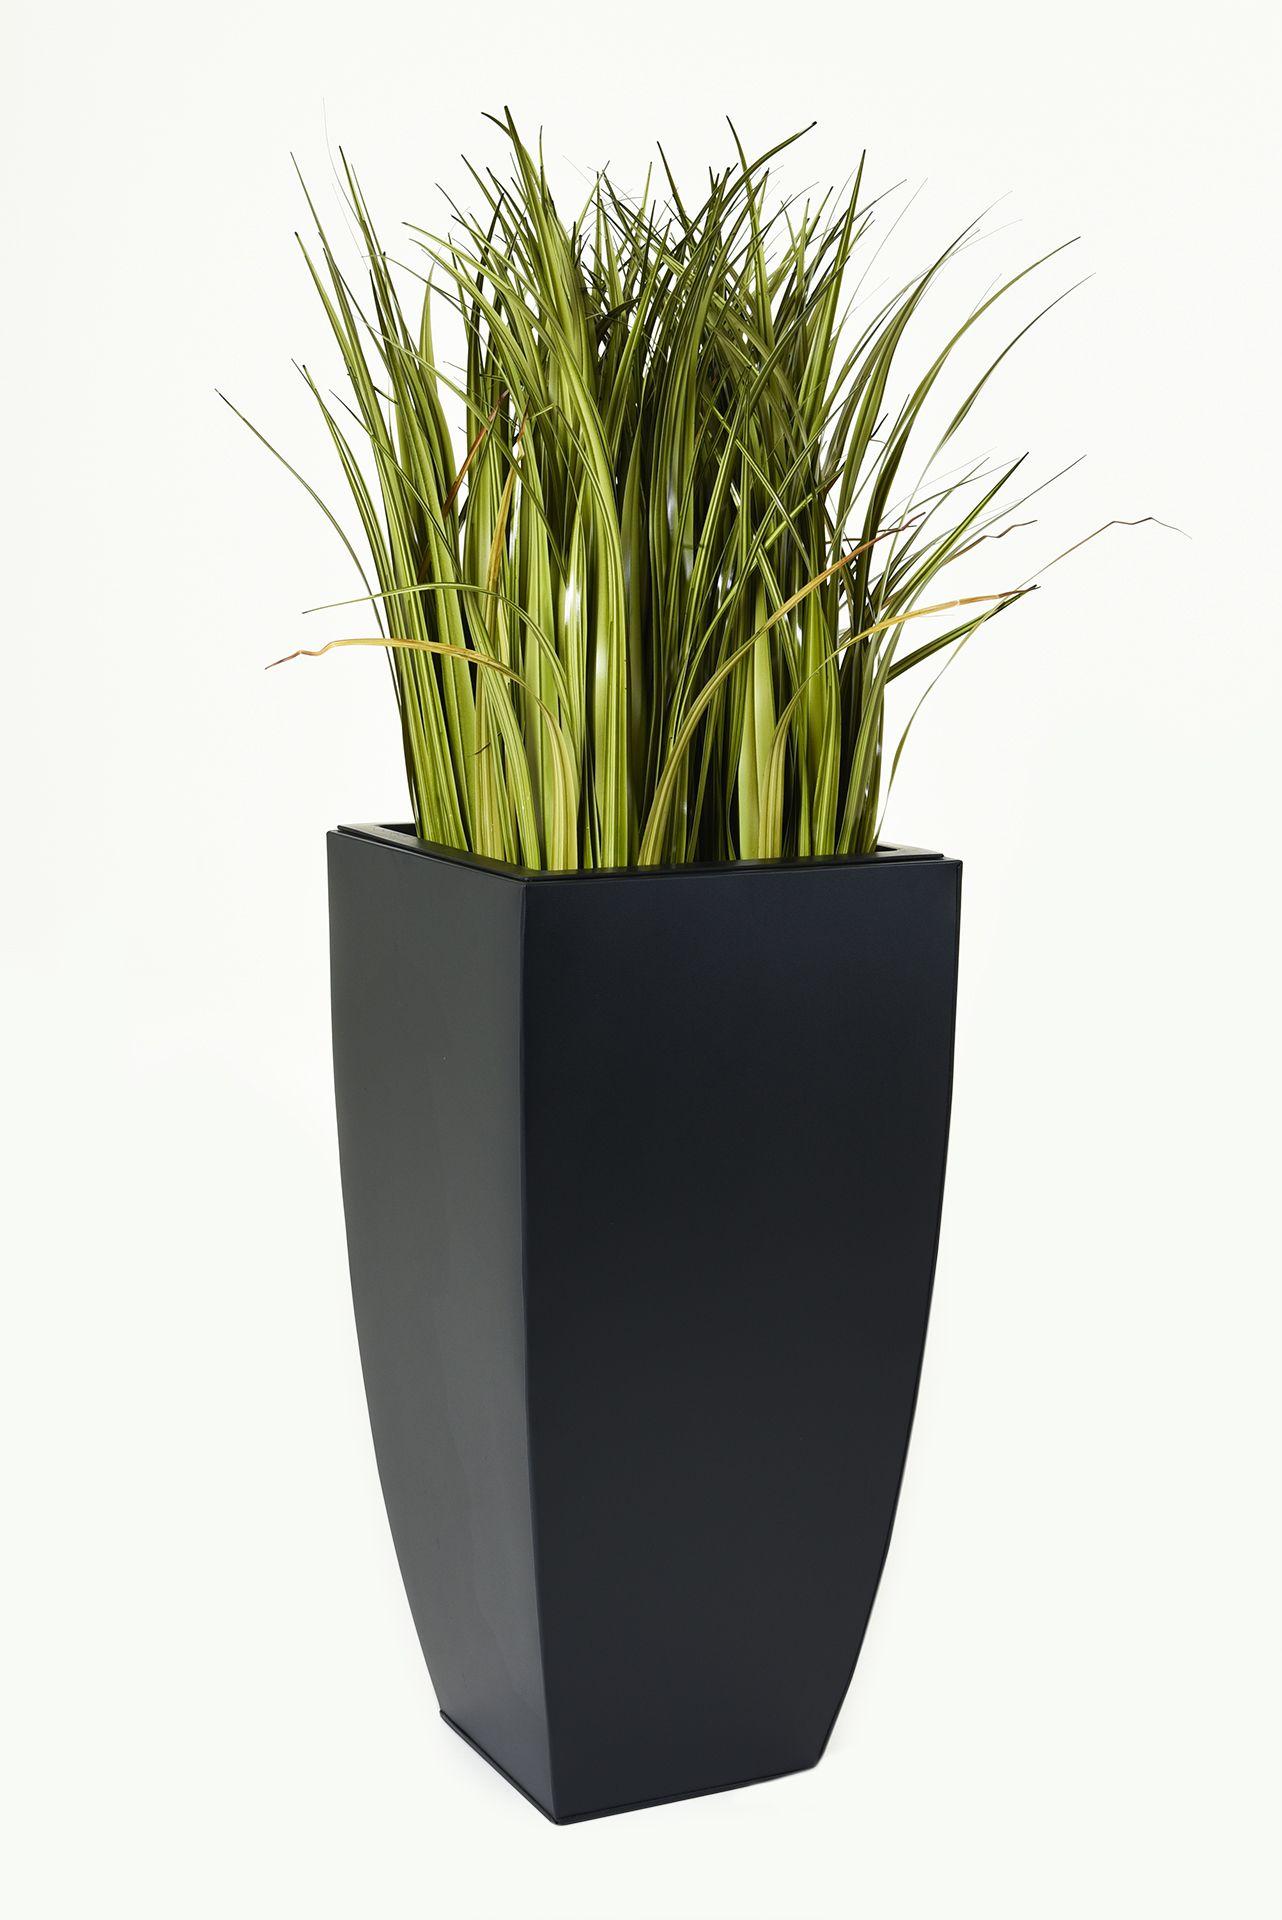 pflanzk bel timeless 80 cm pulverb stahlblech bew sserungsset schwarz ebay. Black Bedroom Furniture Sets. Home Design Ideas